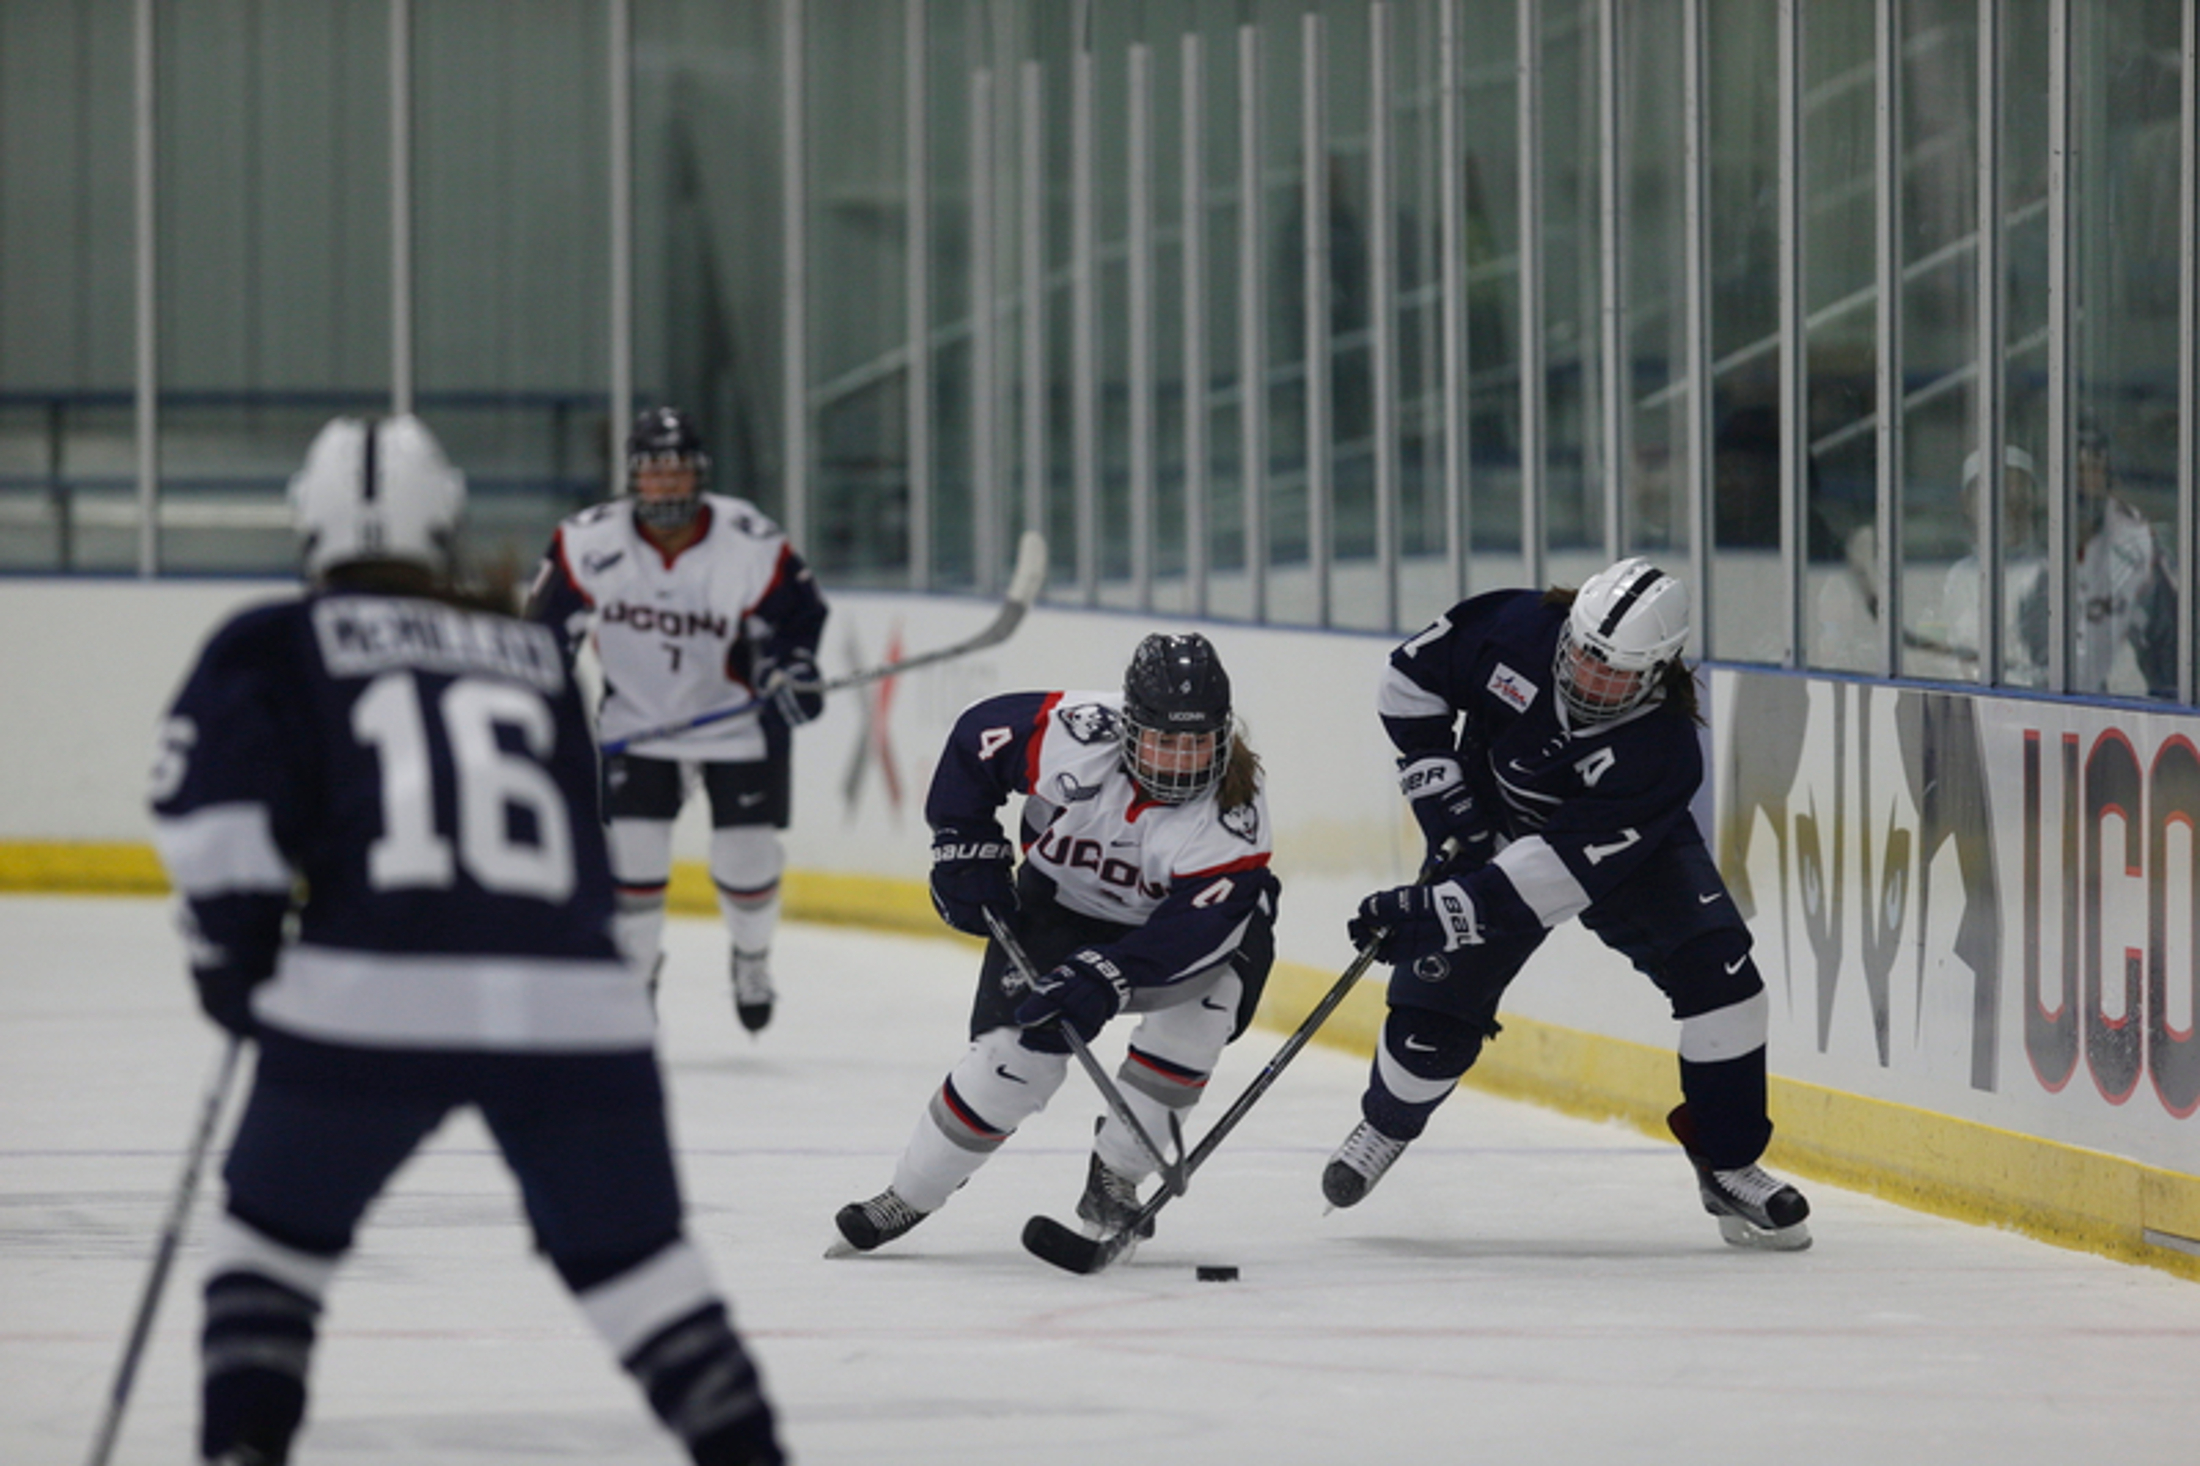 UConn women's hockey against Penn State last season. (File Photo/The Daily Campus)